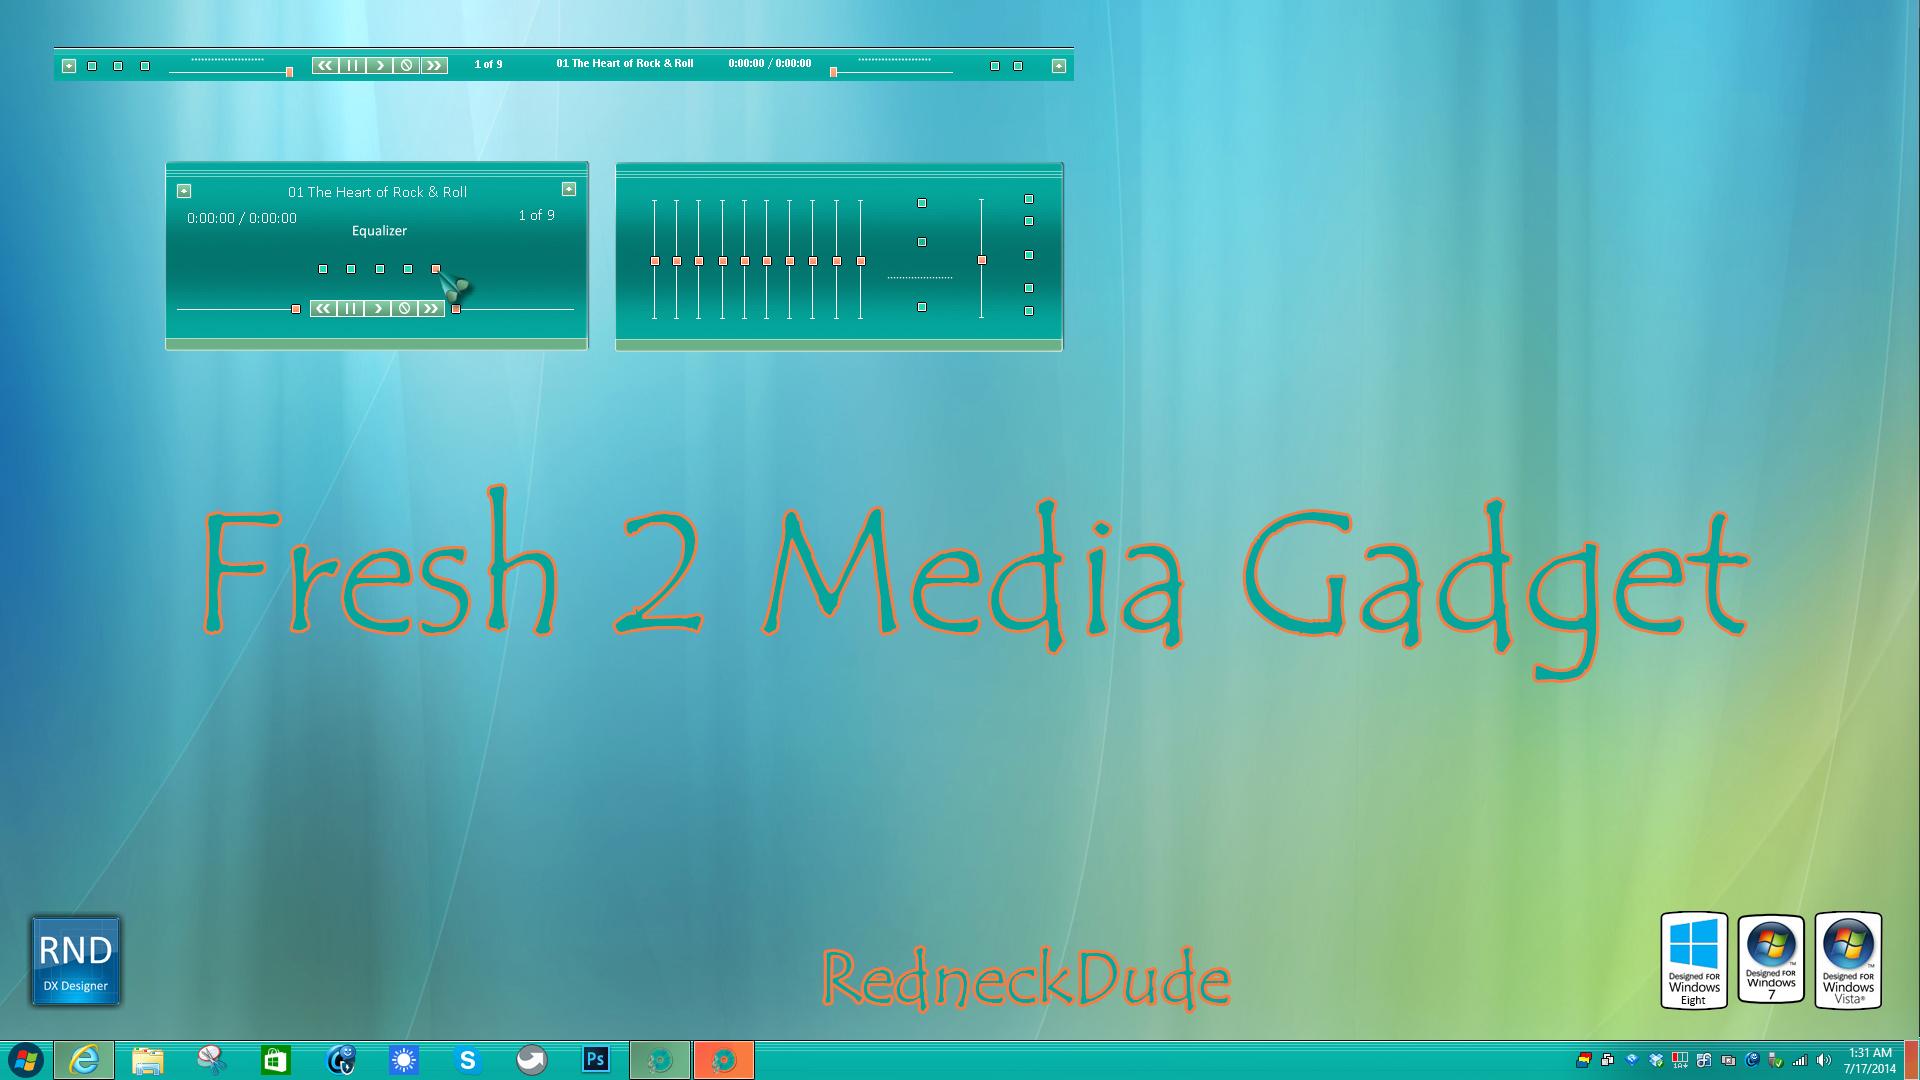 Fresh Media Gadget